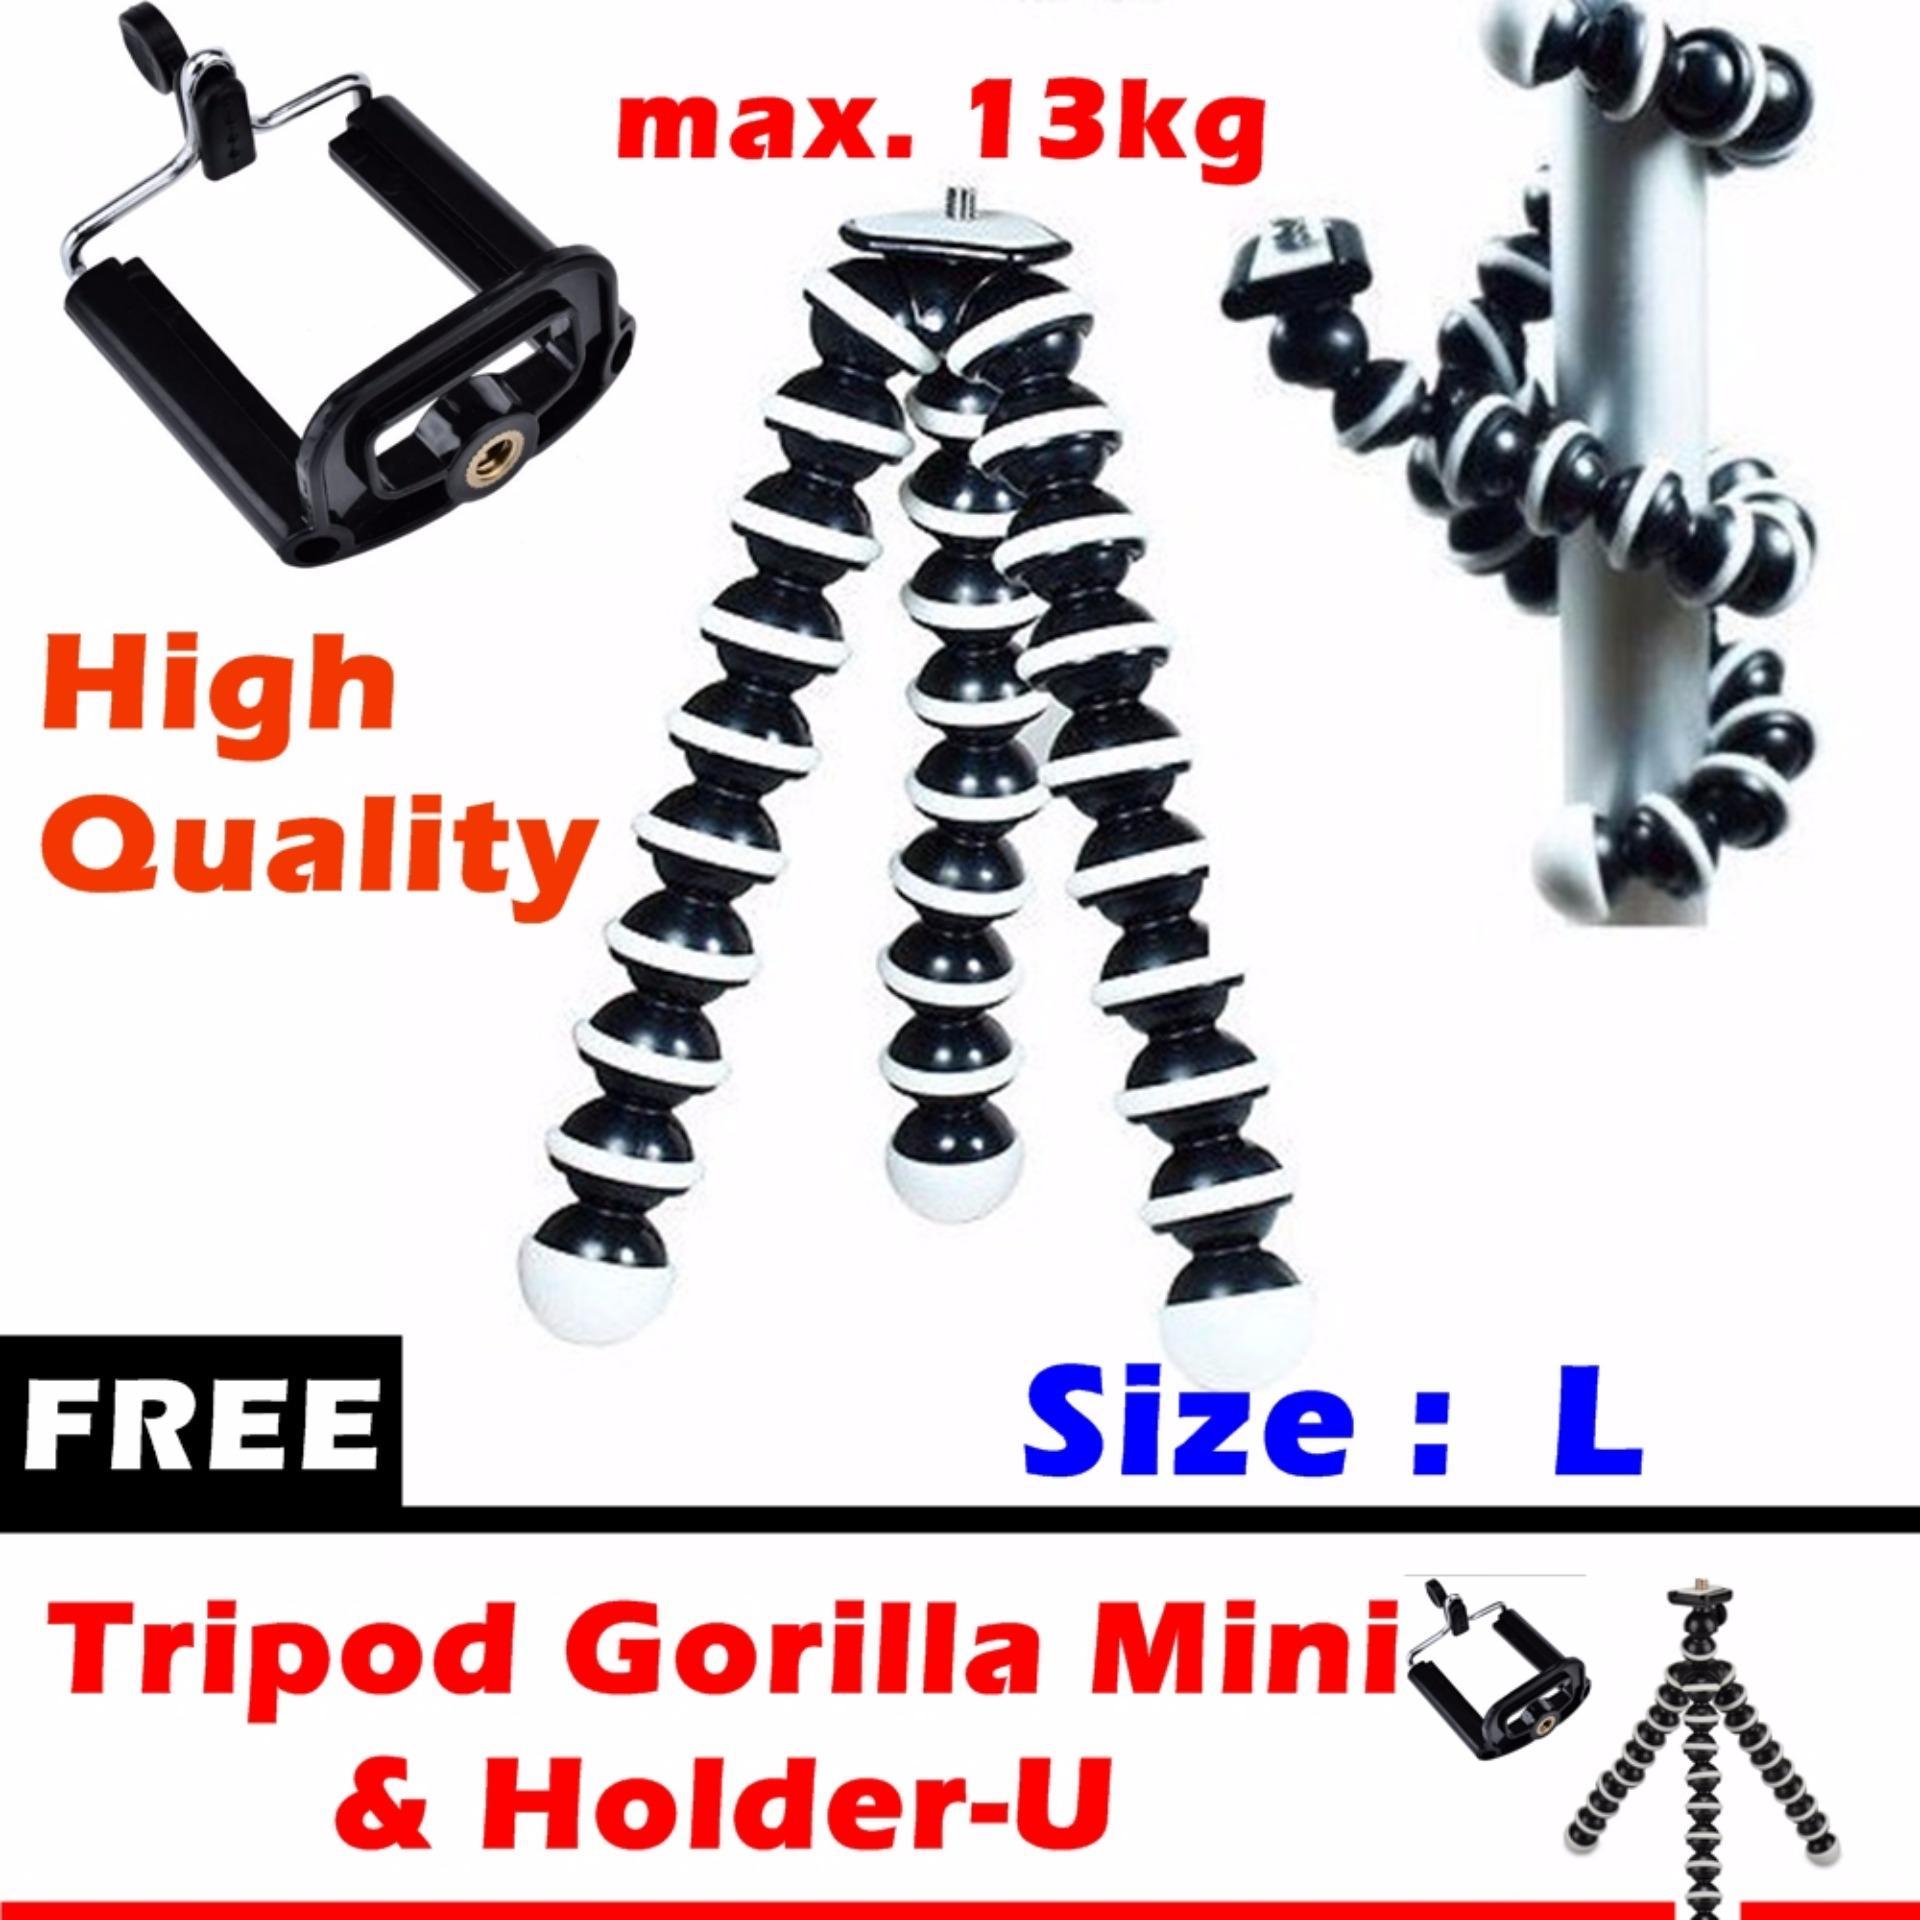 Shock Price Tripod Gorilla Flexible Size L (max 13kg) with Holder-U +